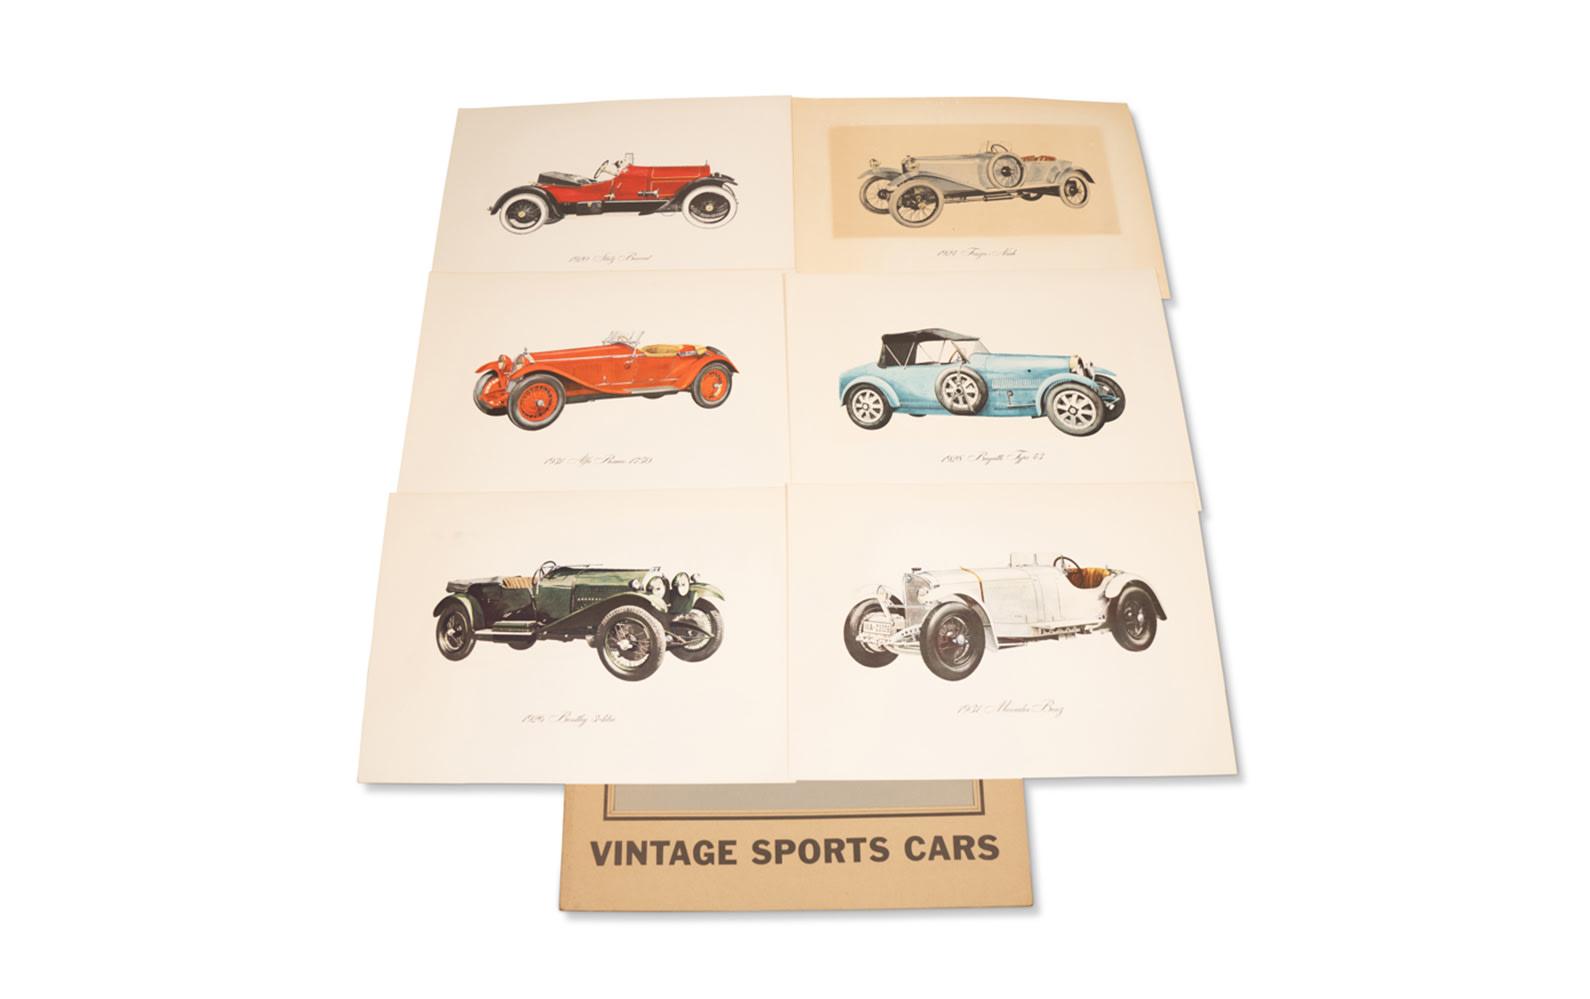 Vintage Sports Cars Prints